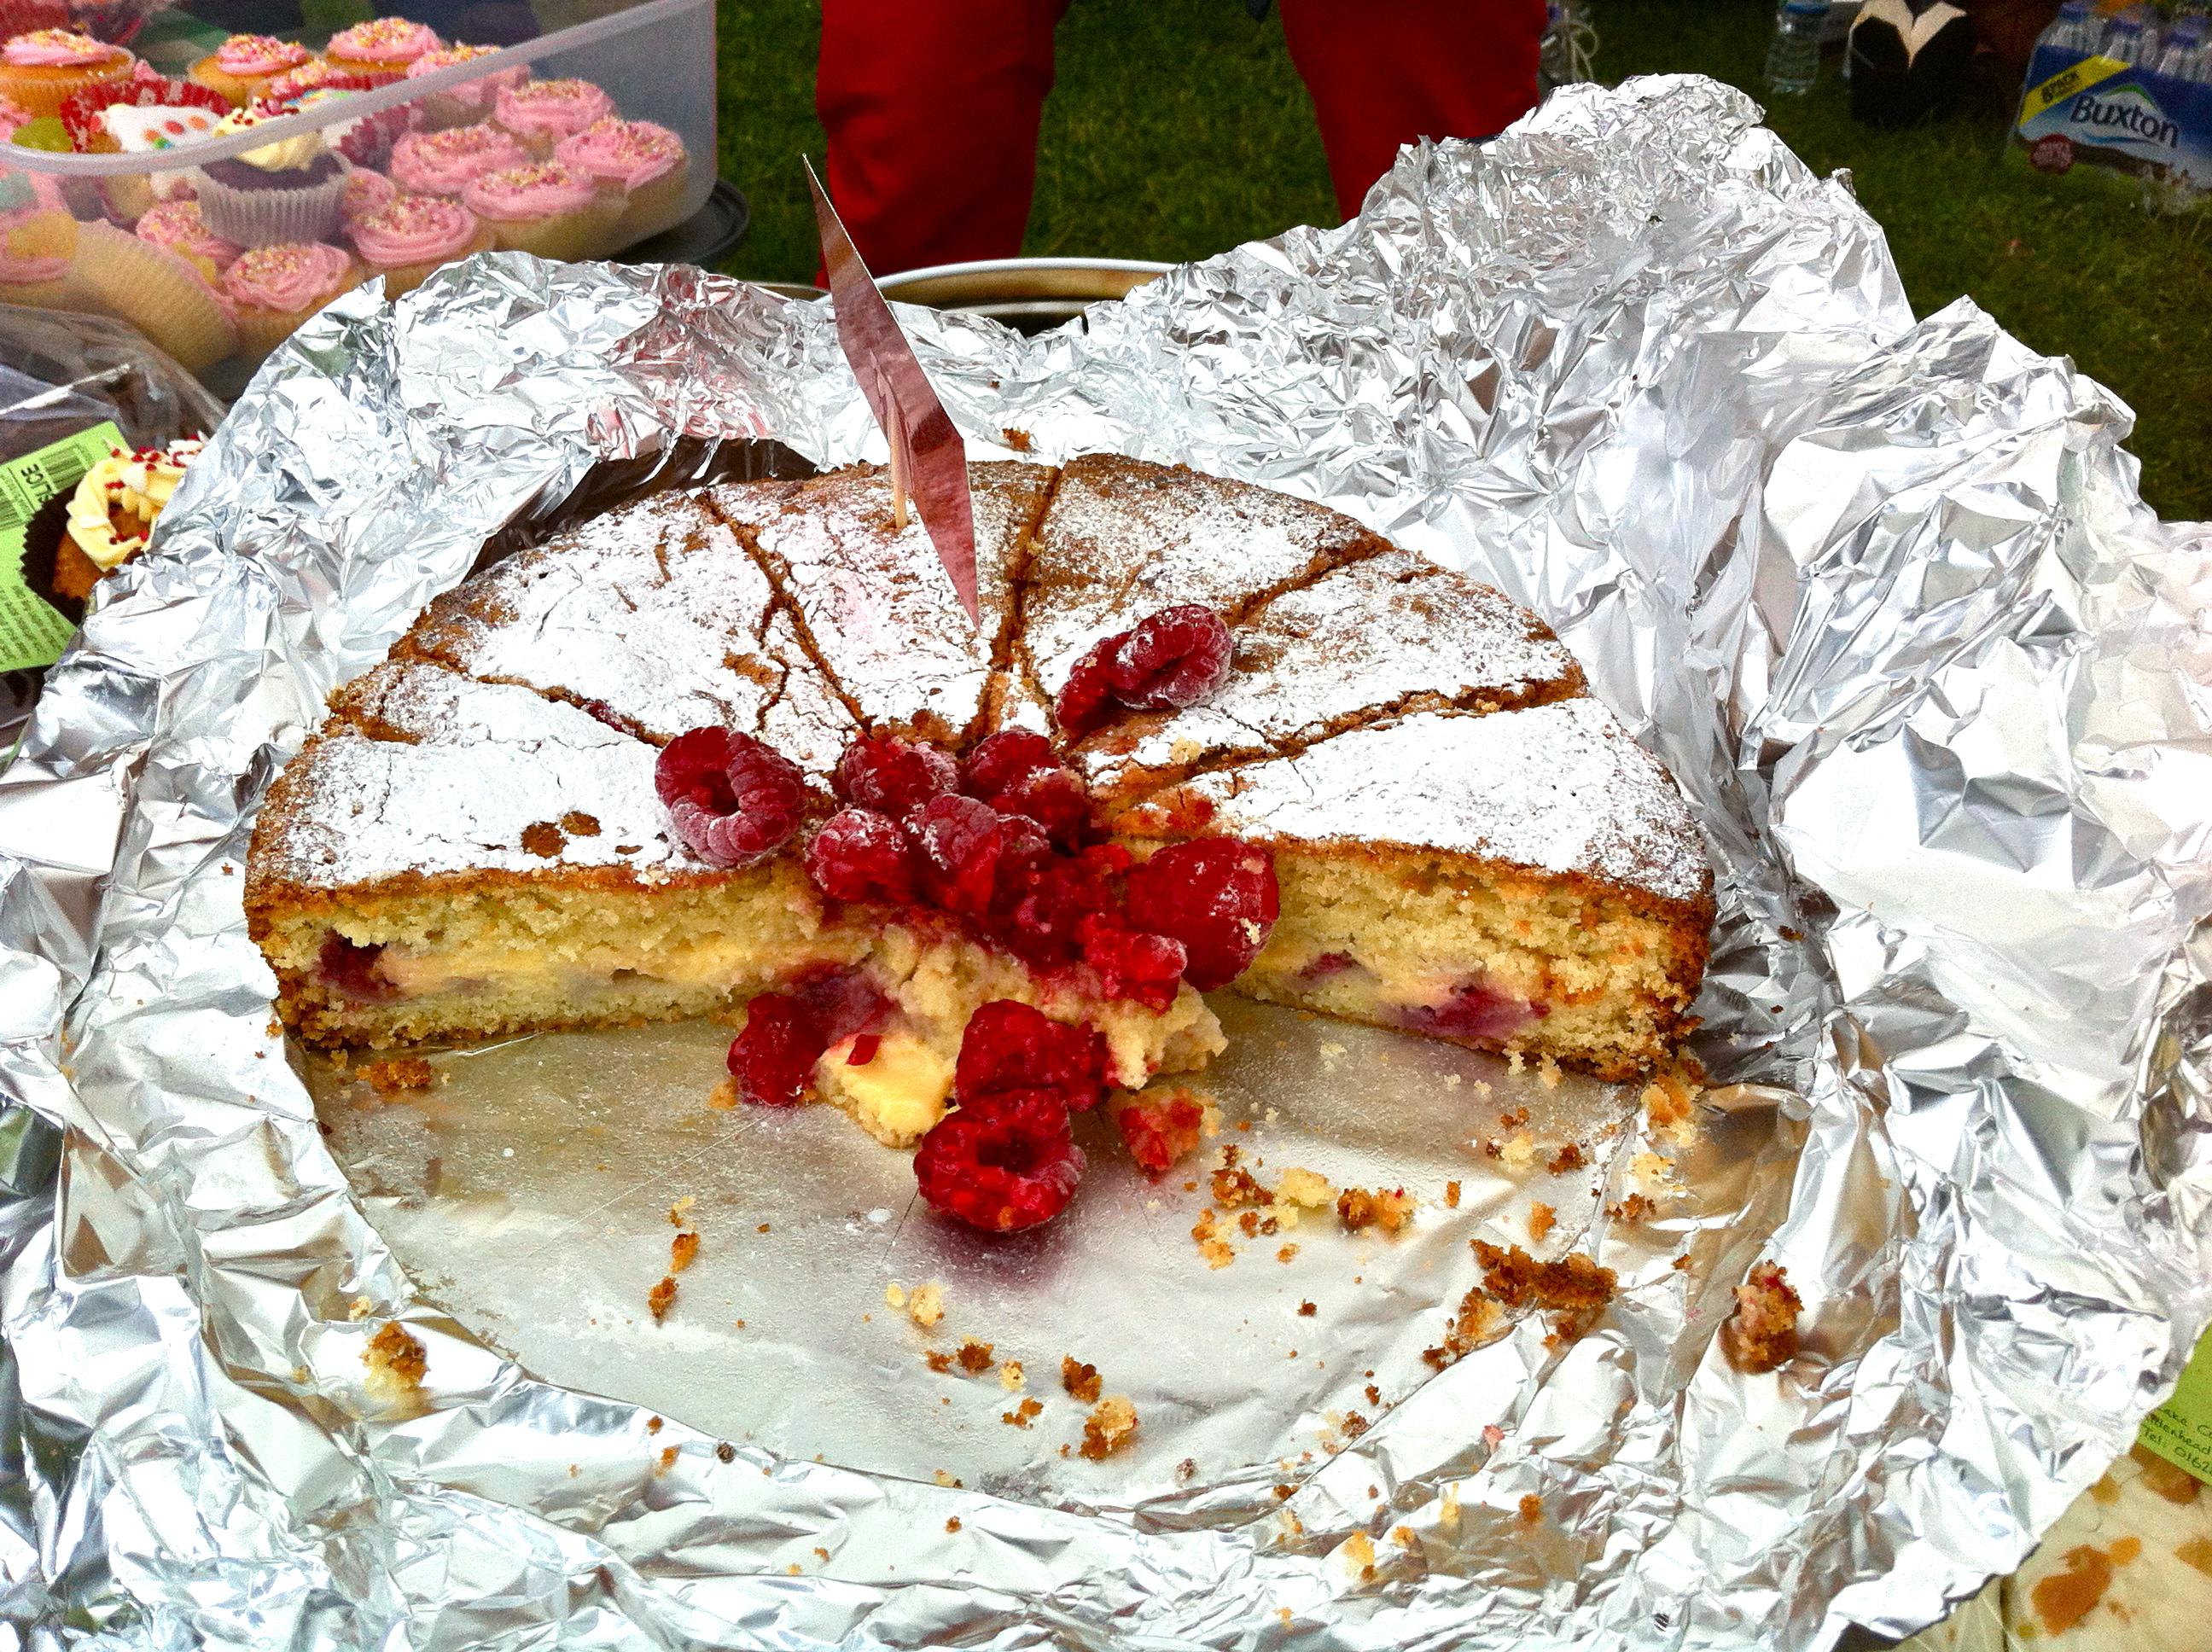 Raspberry and custardcake